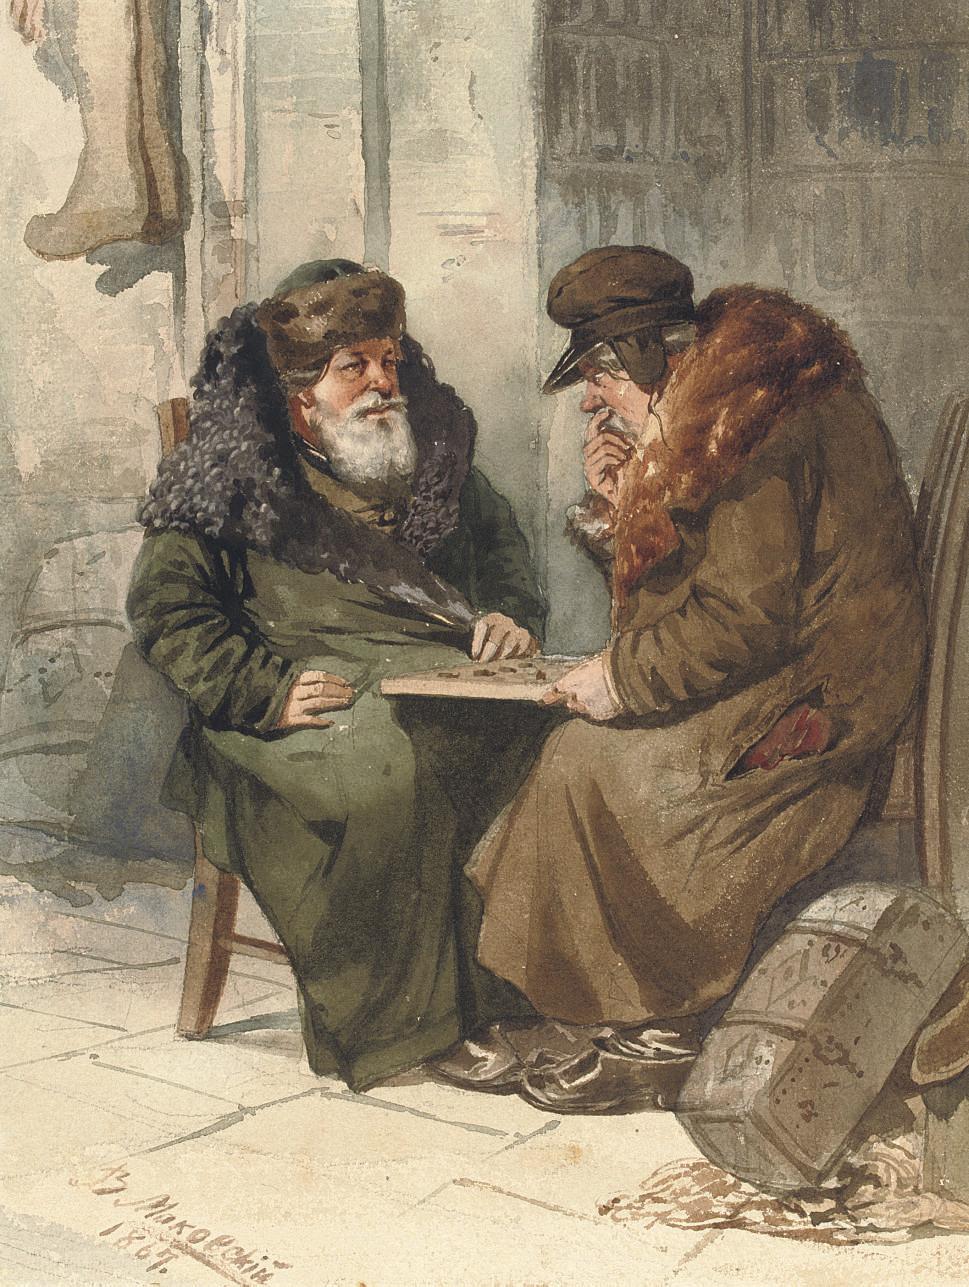 Vladimir Makovsky (1846-1920)